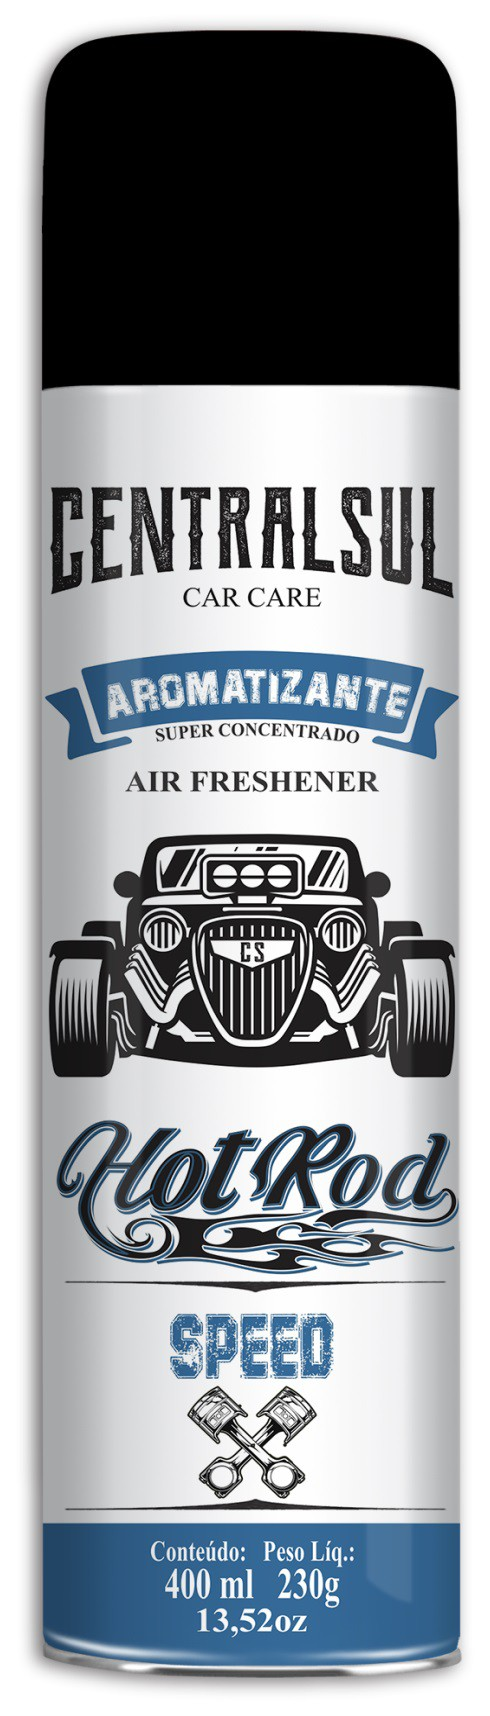 Aromatizante Hot Rod Speed Spray 400ML